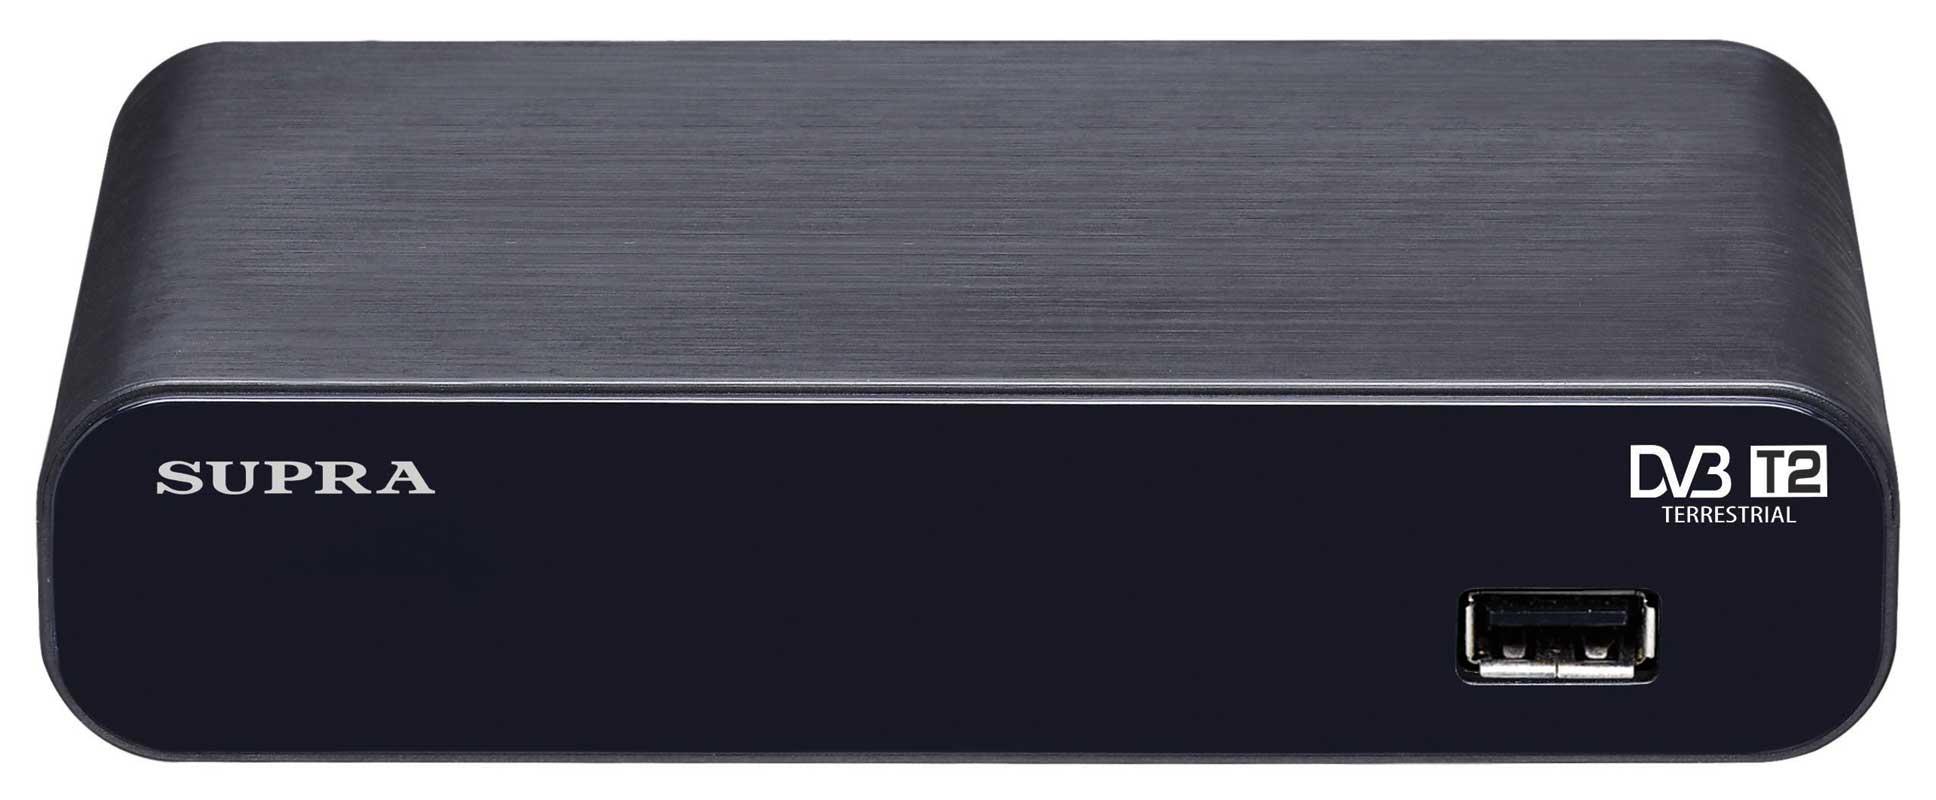 DVB-T2 ресивер Supra